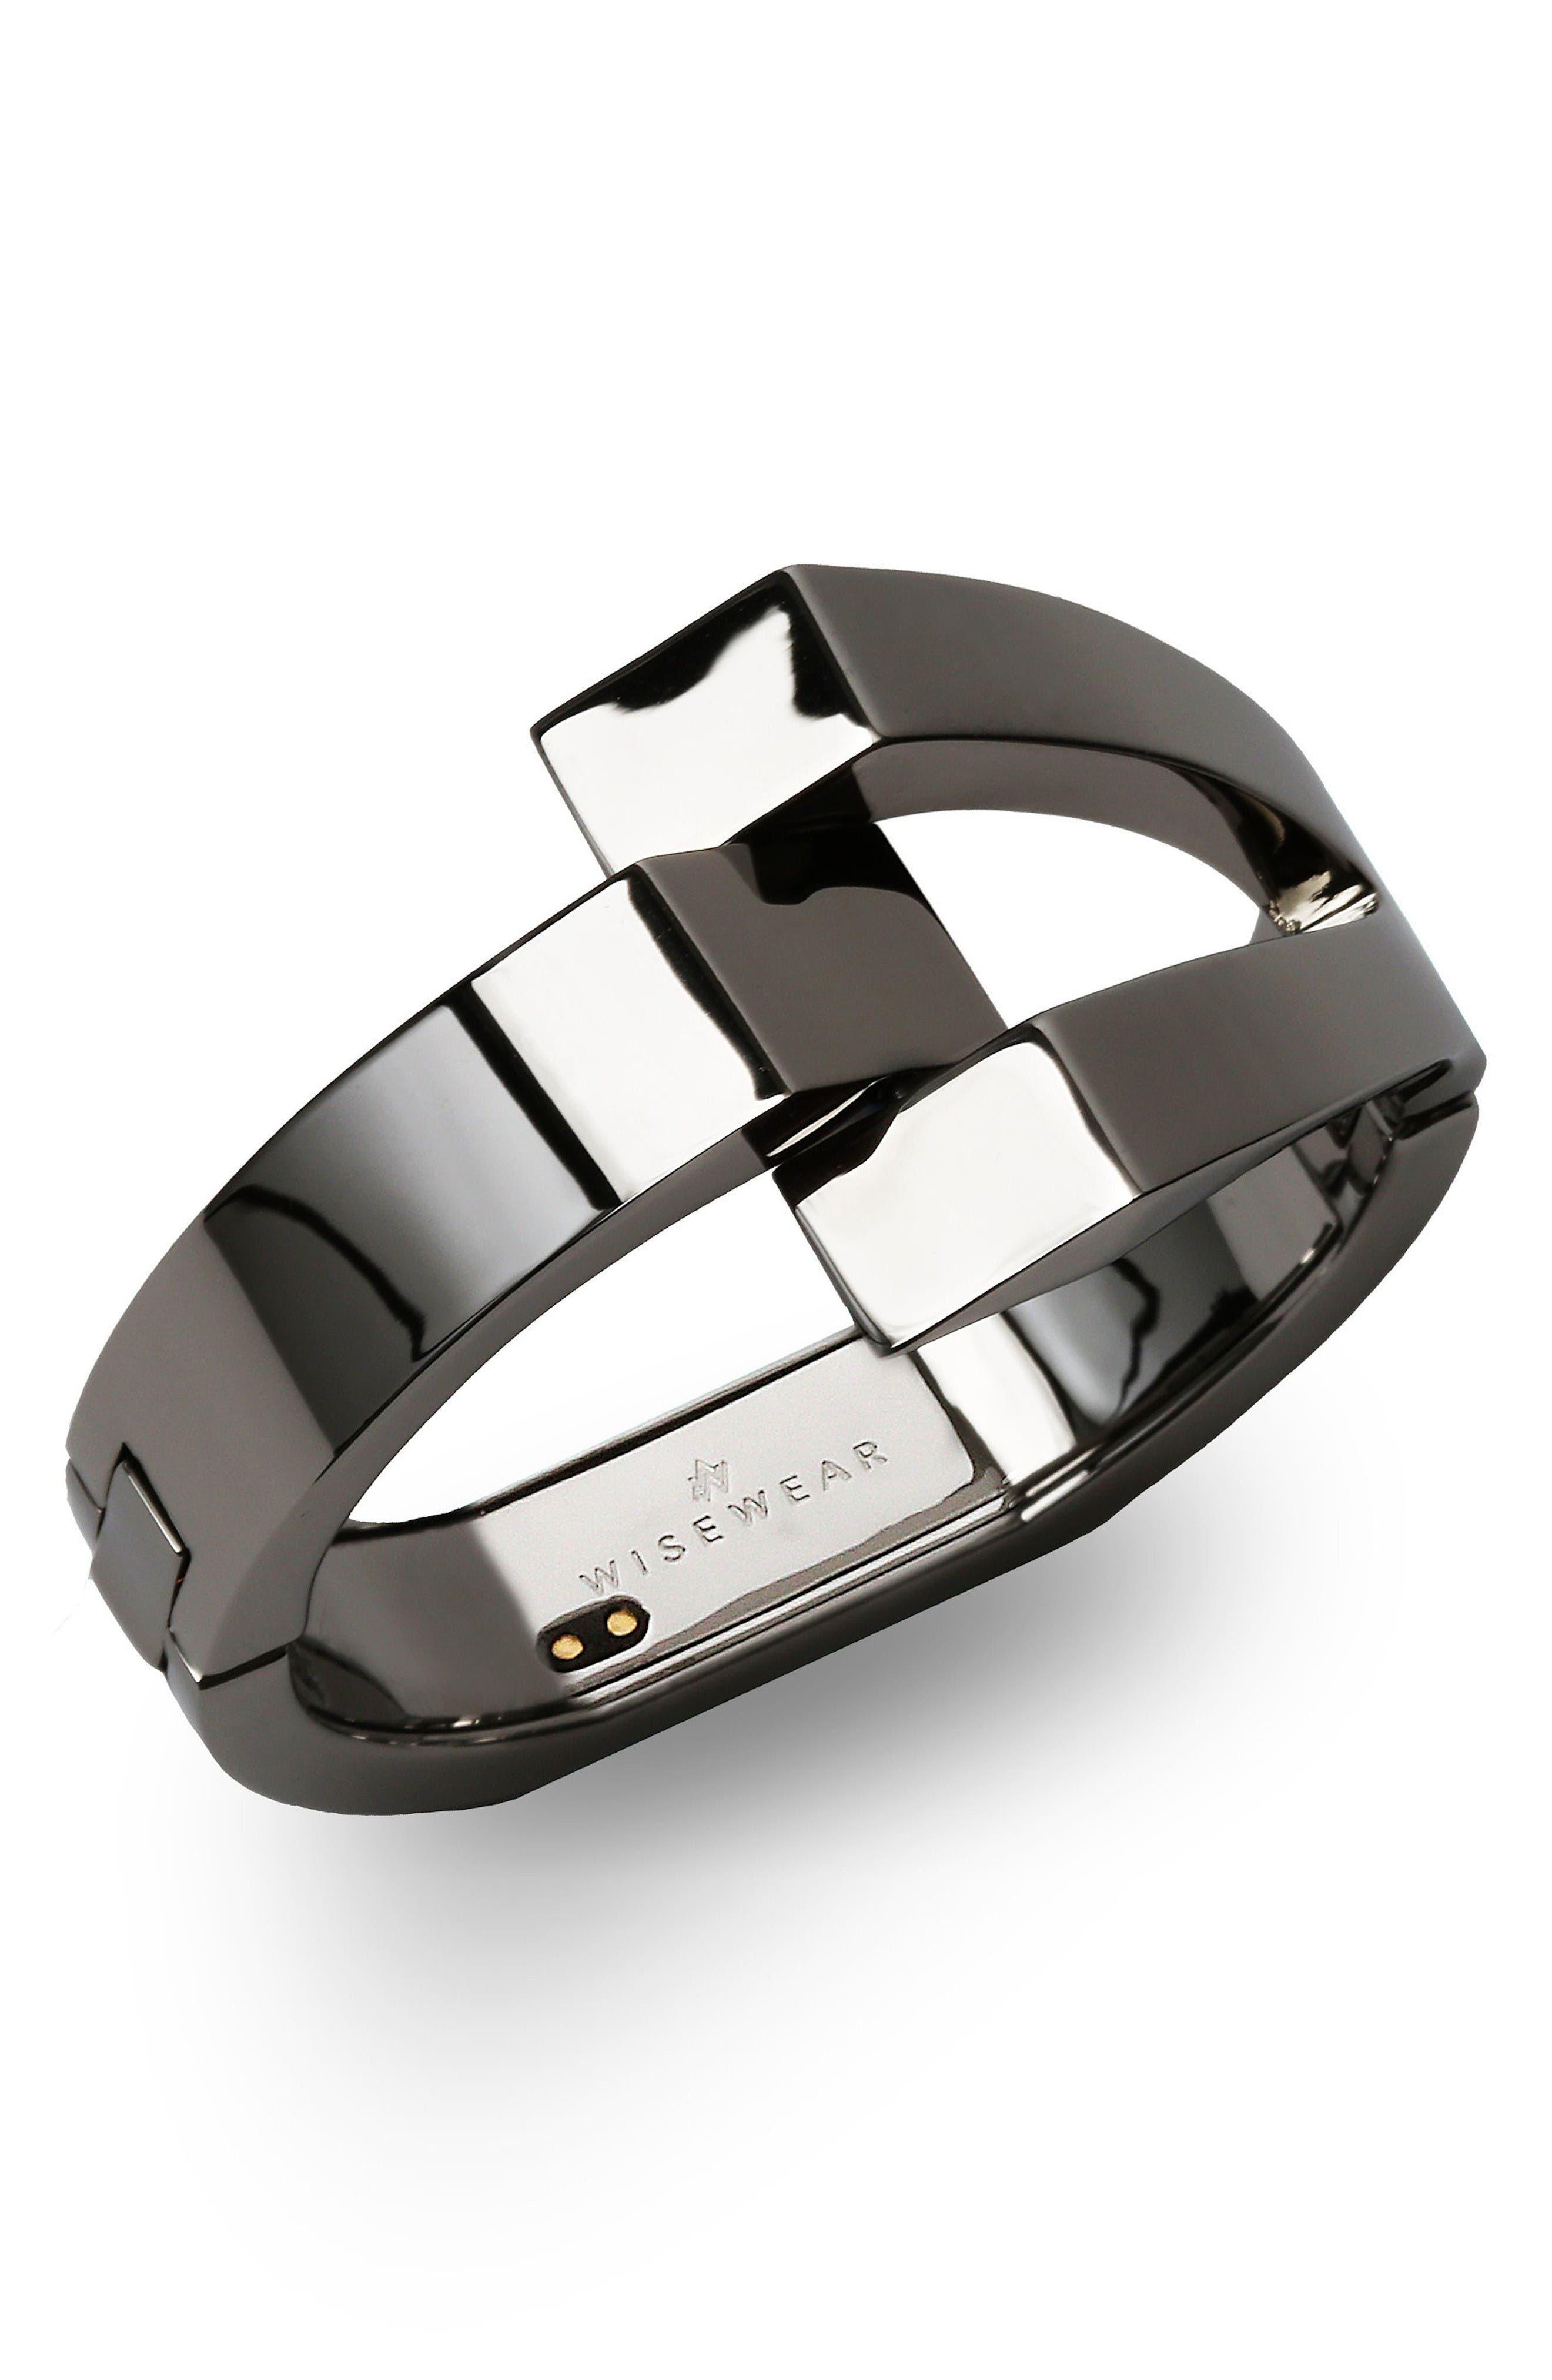 Main Image - WiseWear Calder Activity Tracker Bangle